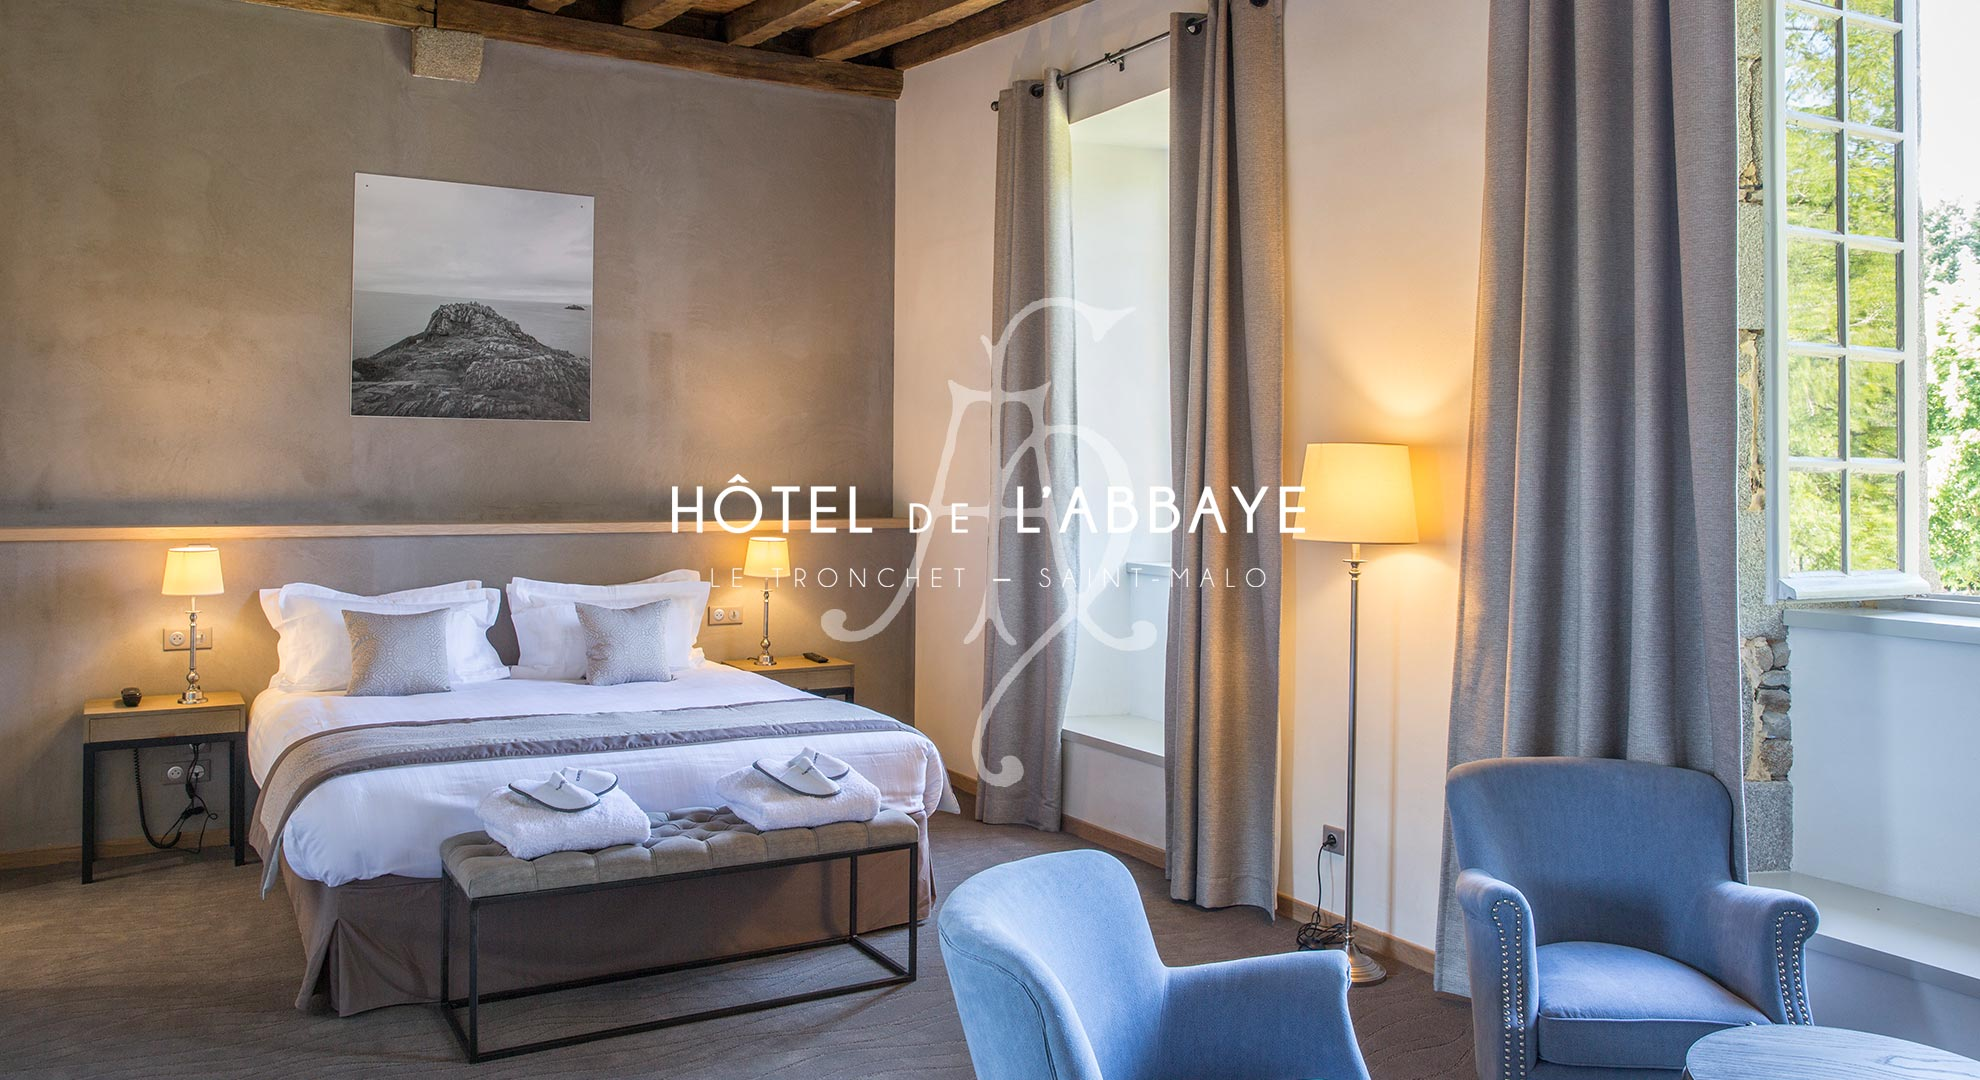 Hotel Brittany Hotel De L Abbaye Du Tronchet Saint Malo